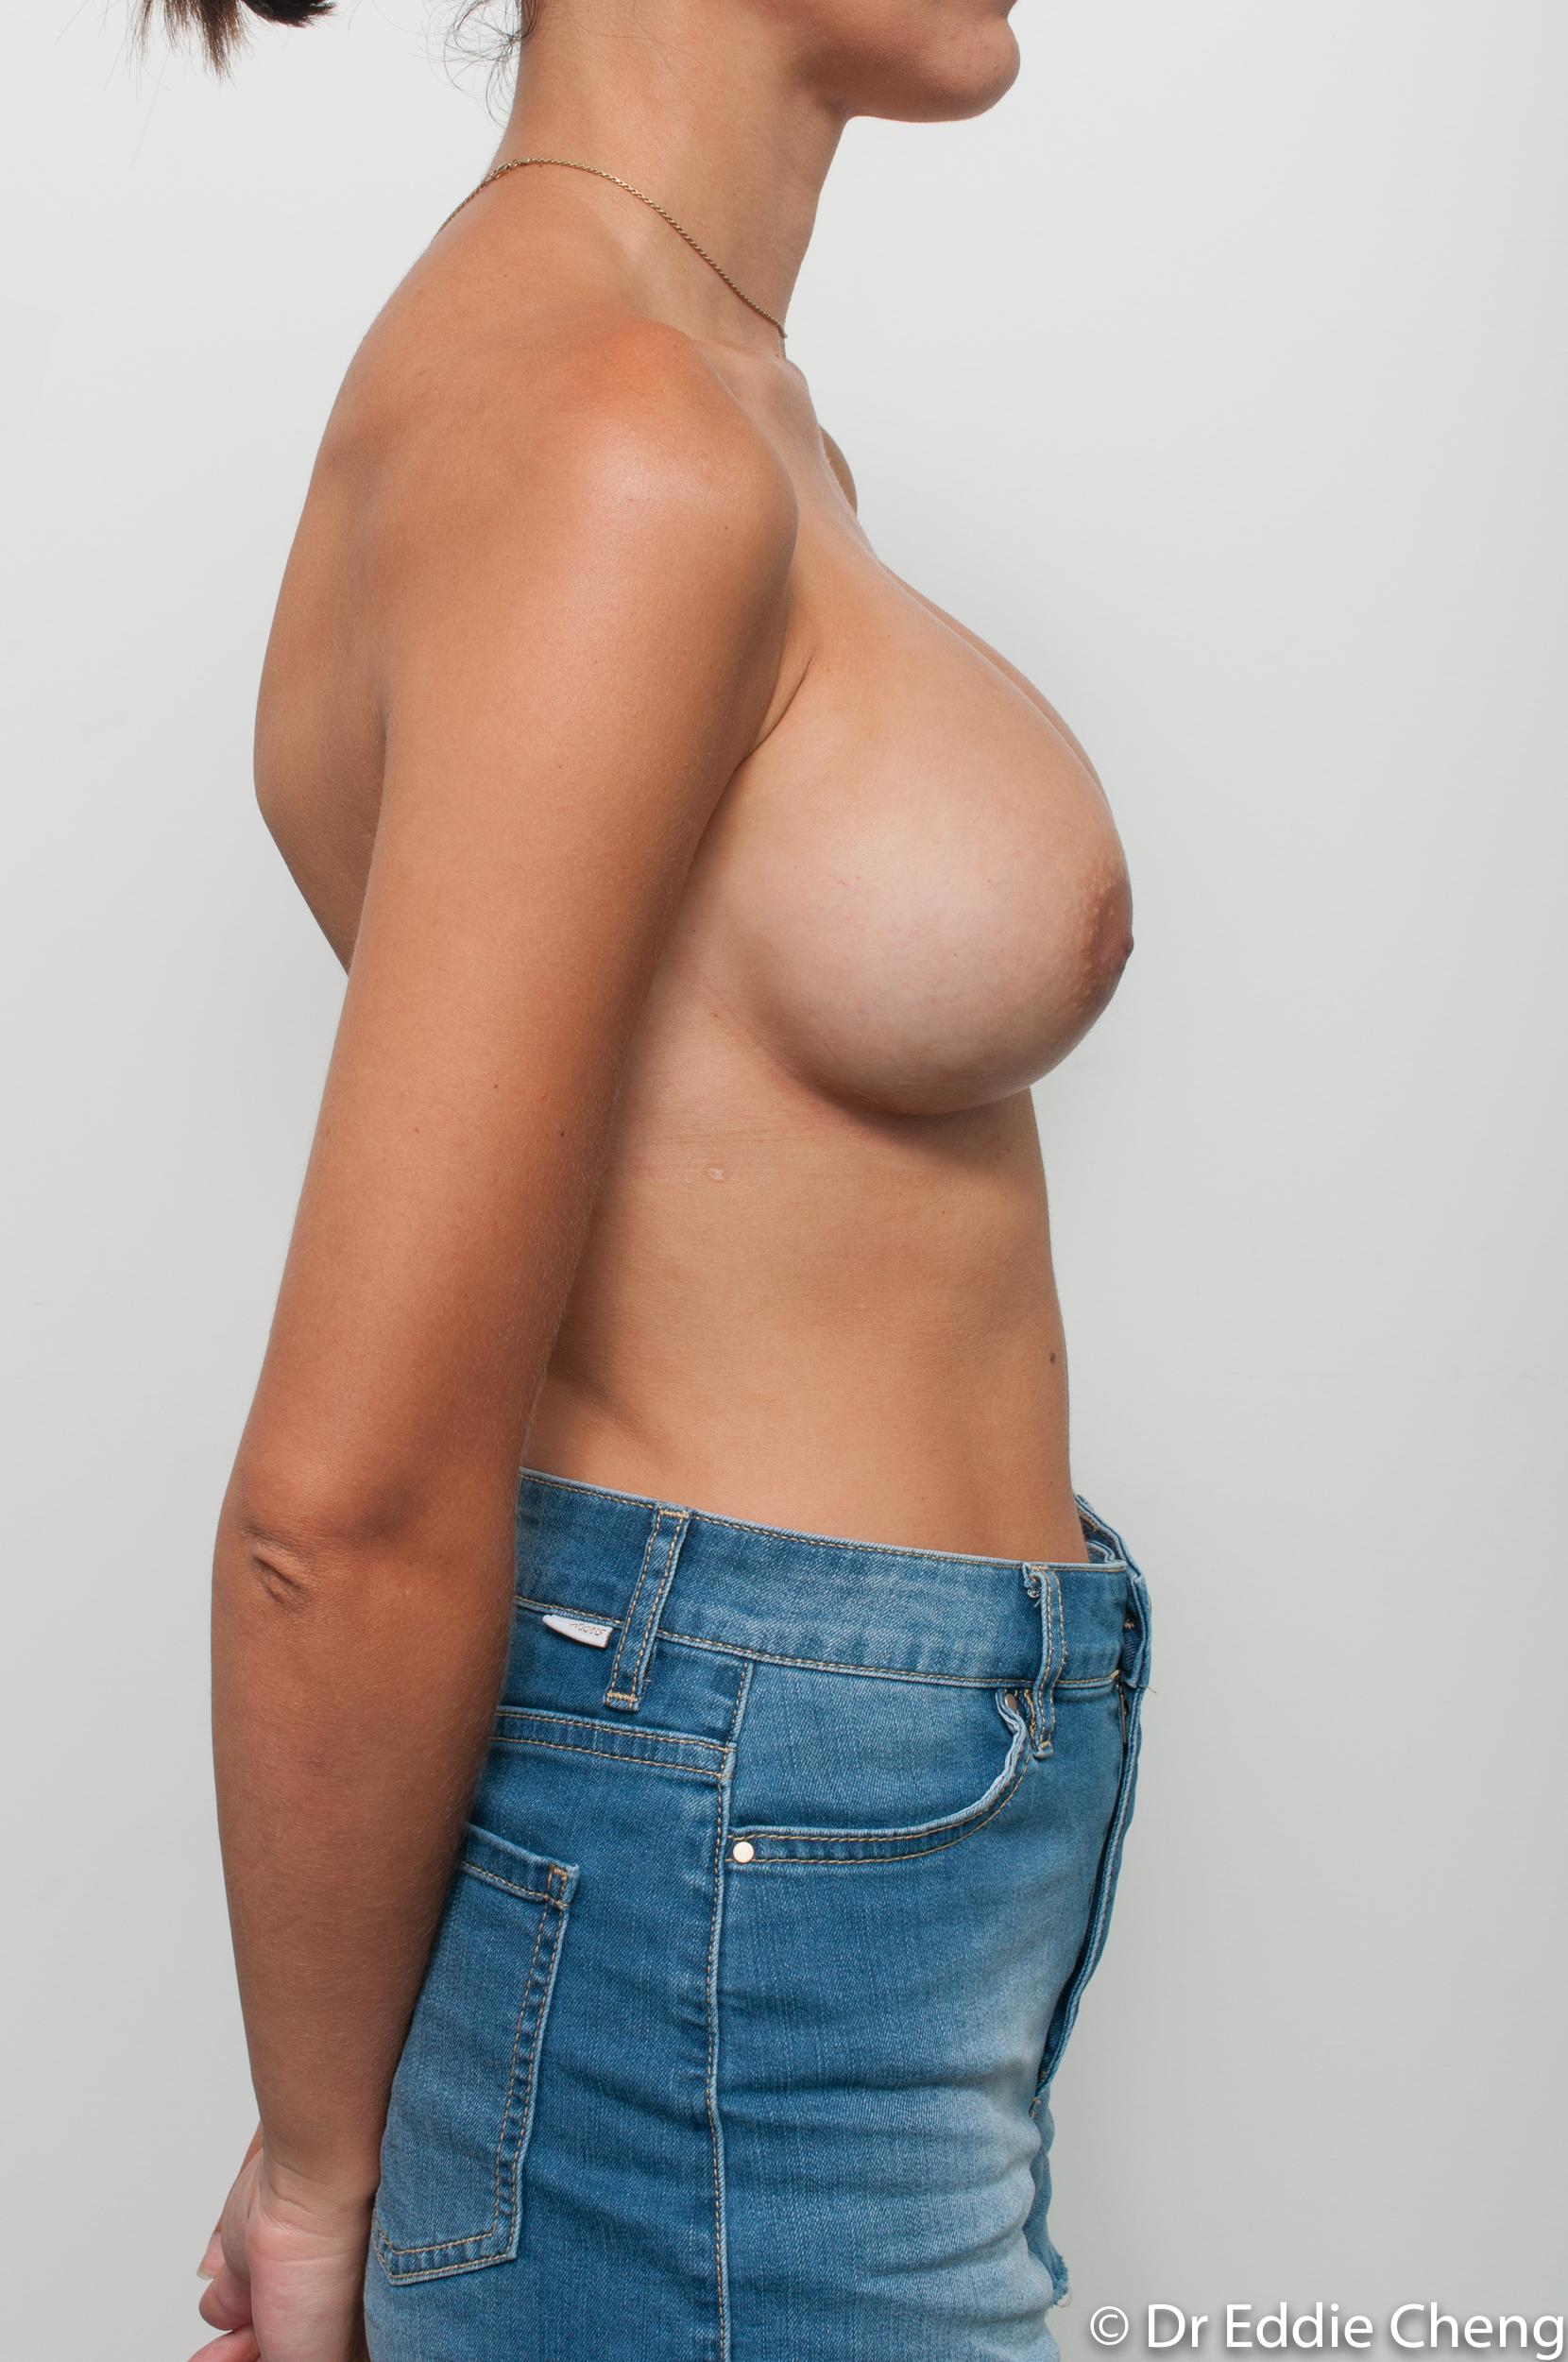 breast implant revision dr eddie cheng brisbane-6